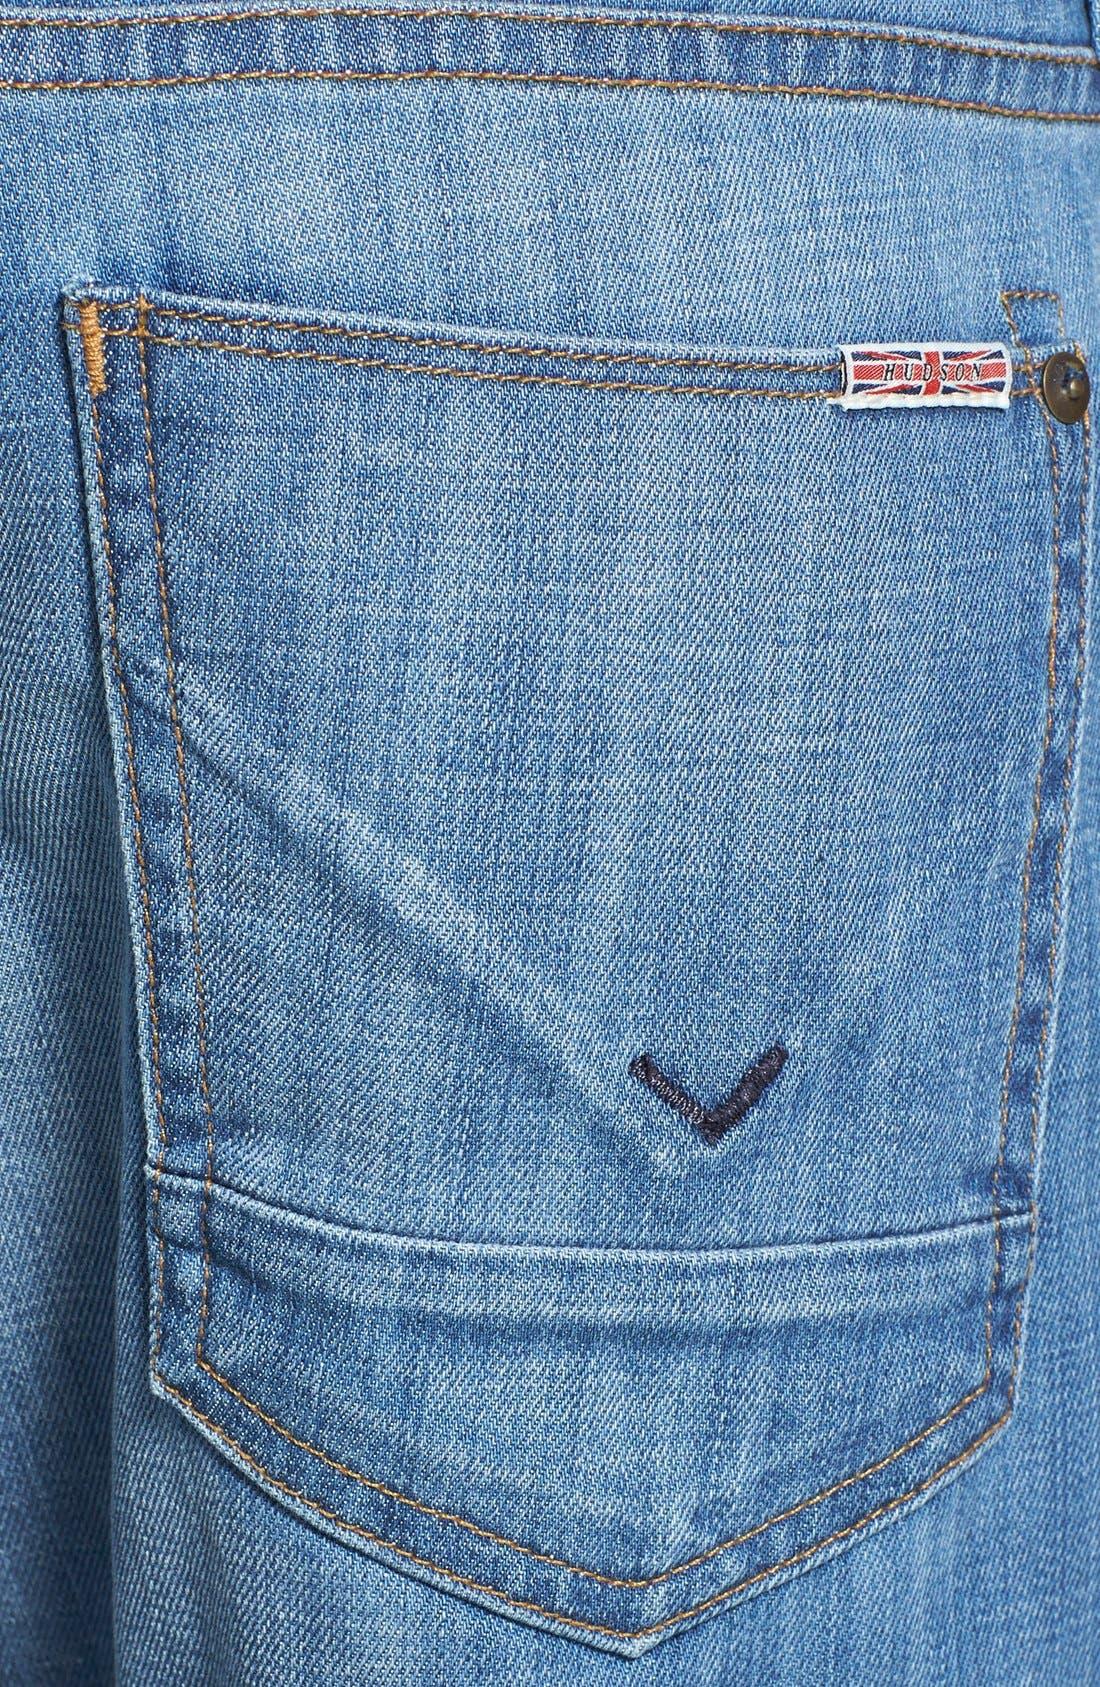 Alternate Image 4  - Hudson Jeans 'Byron' Straight Leg Jeans (Comrade)